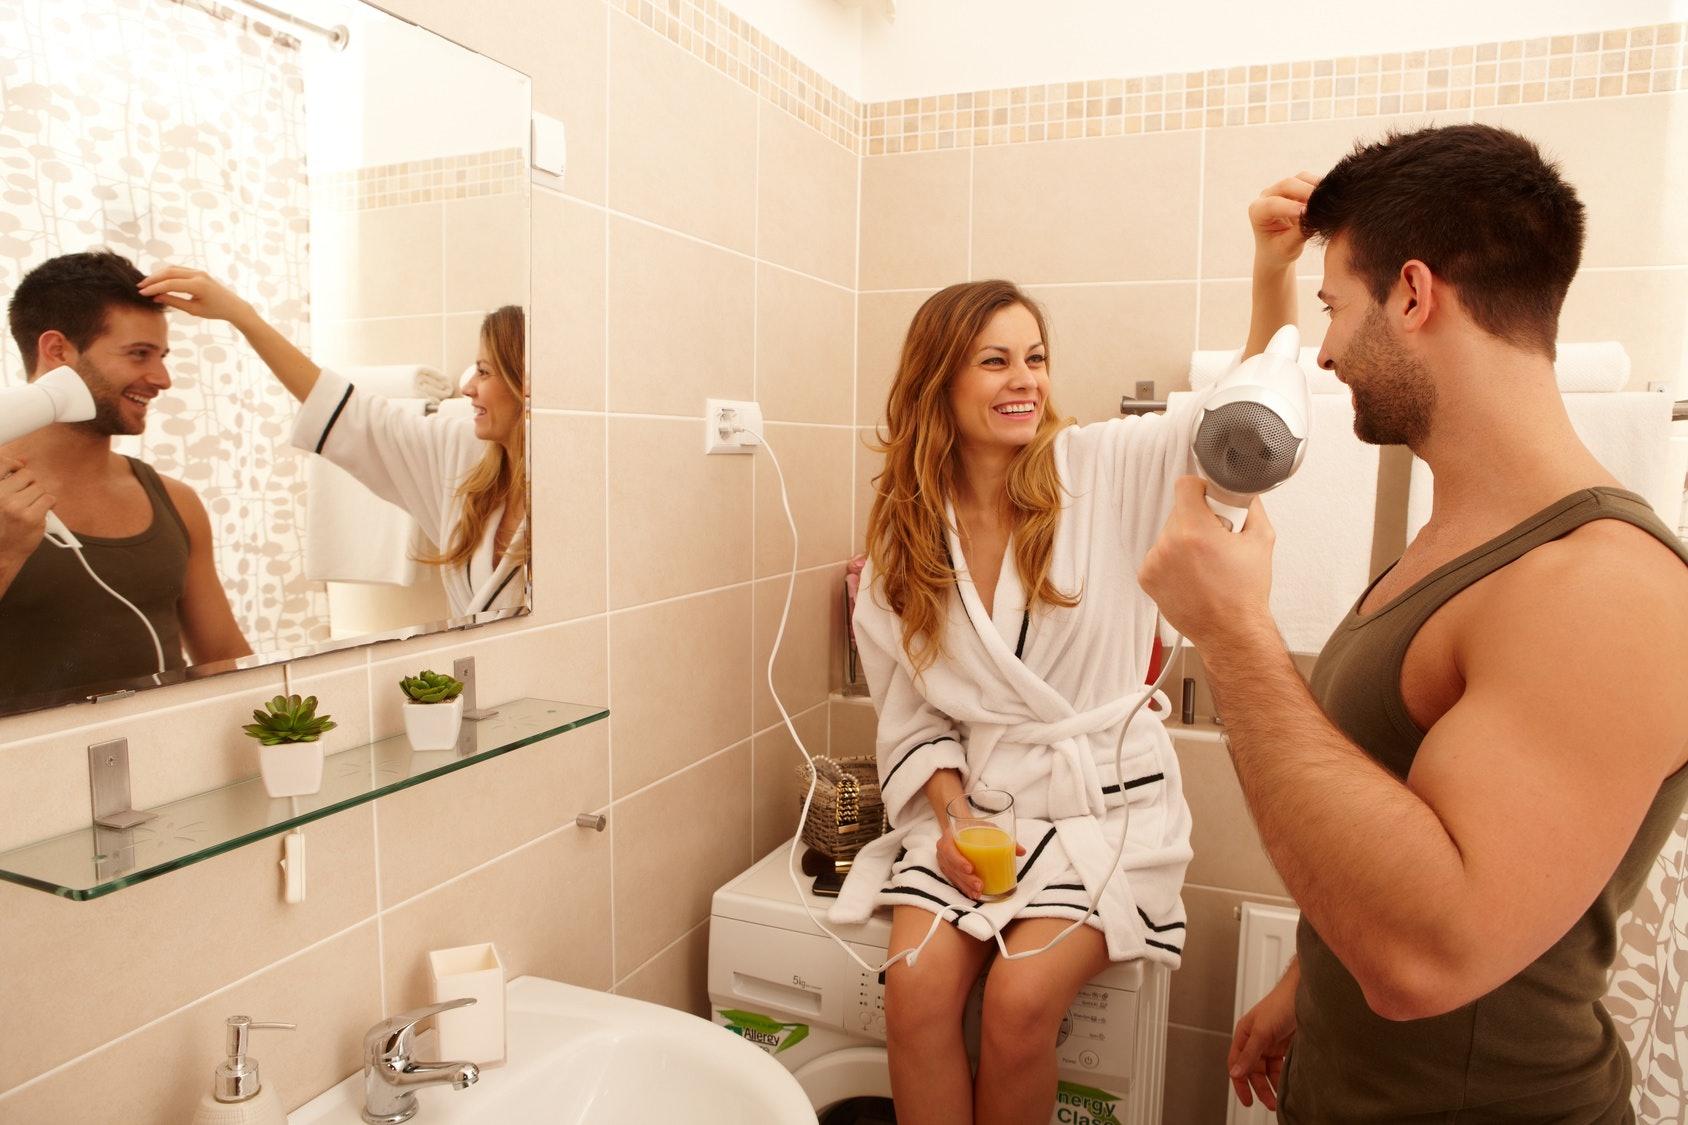 Whilst her boyfriend was in the bathroom pics 561